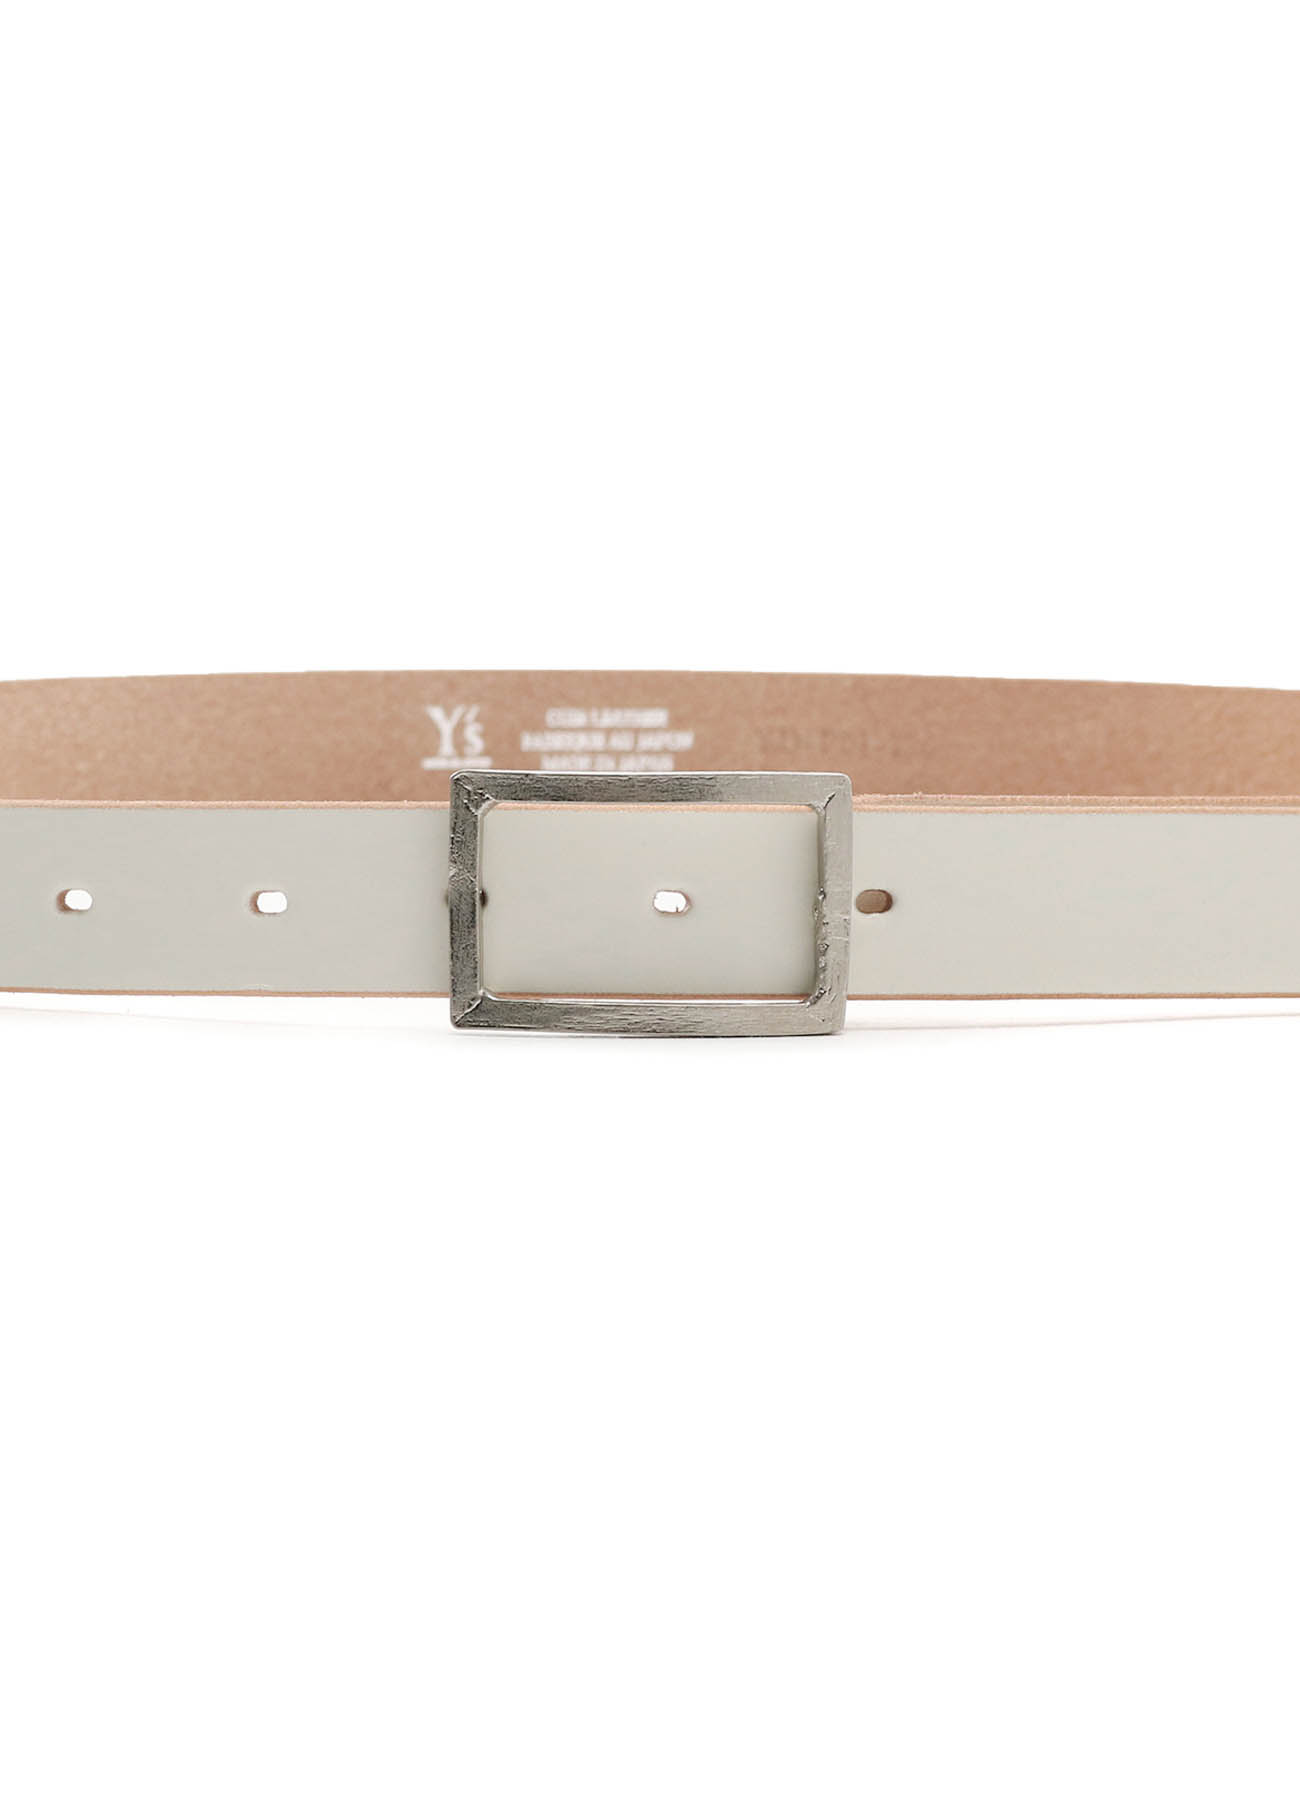 BELT NUME LEATHER 24mm SHARP BUCKLE BELT